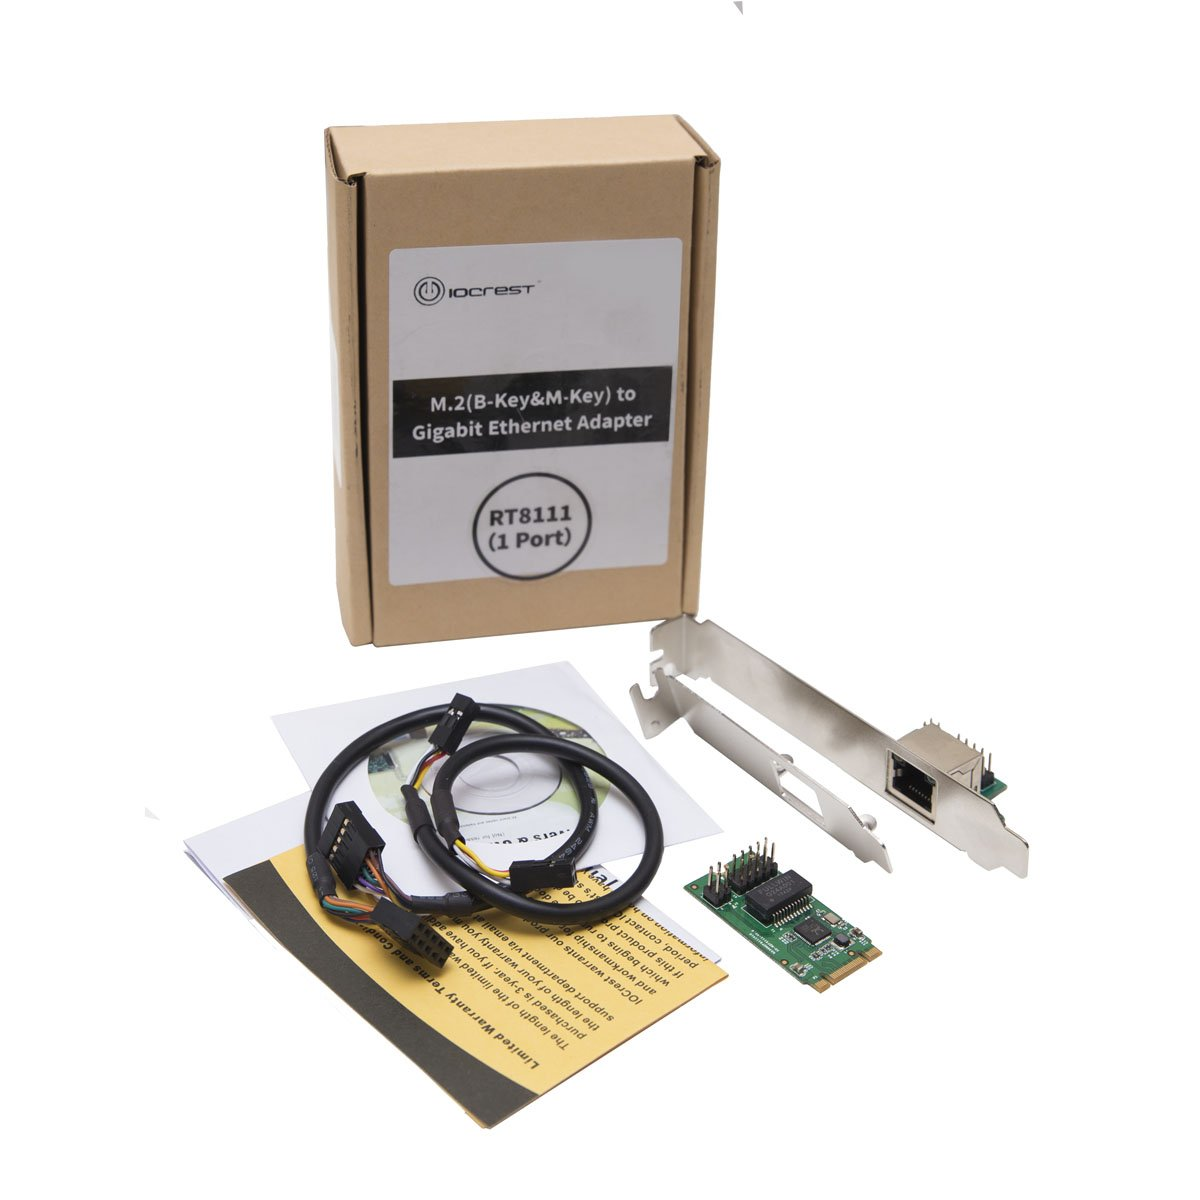 I//O Crest M.2 PCIe Interface Single Port Gigabit Ethernet Modules NIC RealTek RTL8111 Chipset B /& M-Key